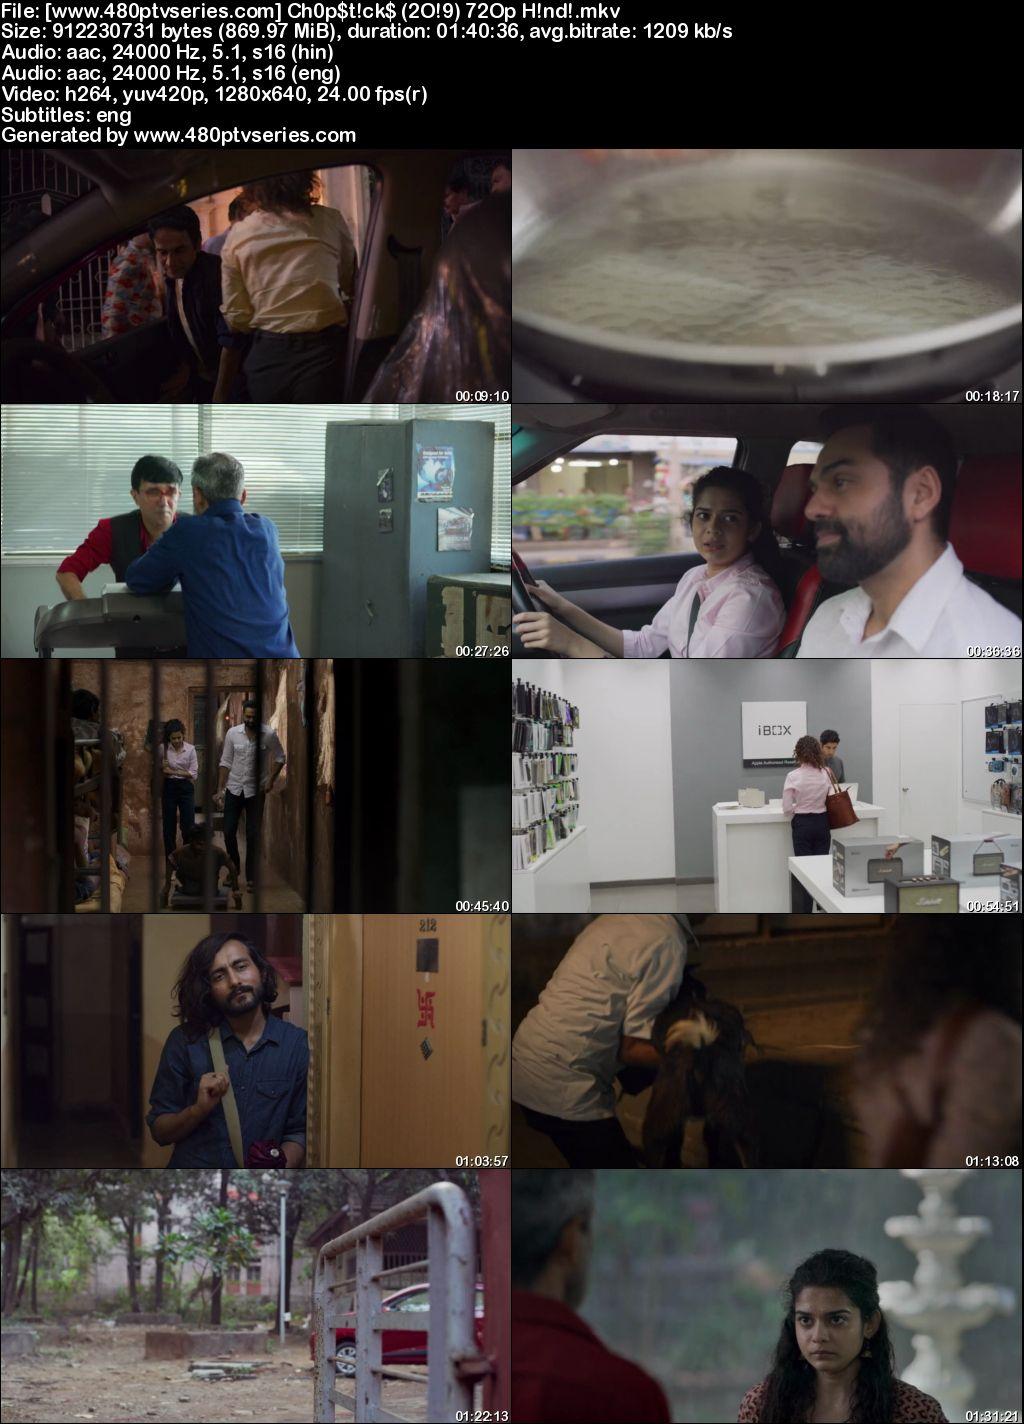 Watch Online Free Chopsticks (2019) Full Hindi Dual Audio Movie Download 480p 720p HDRip